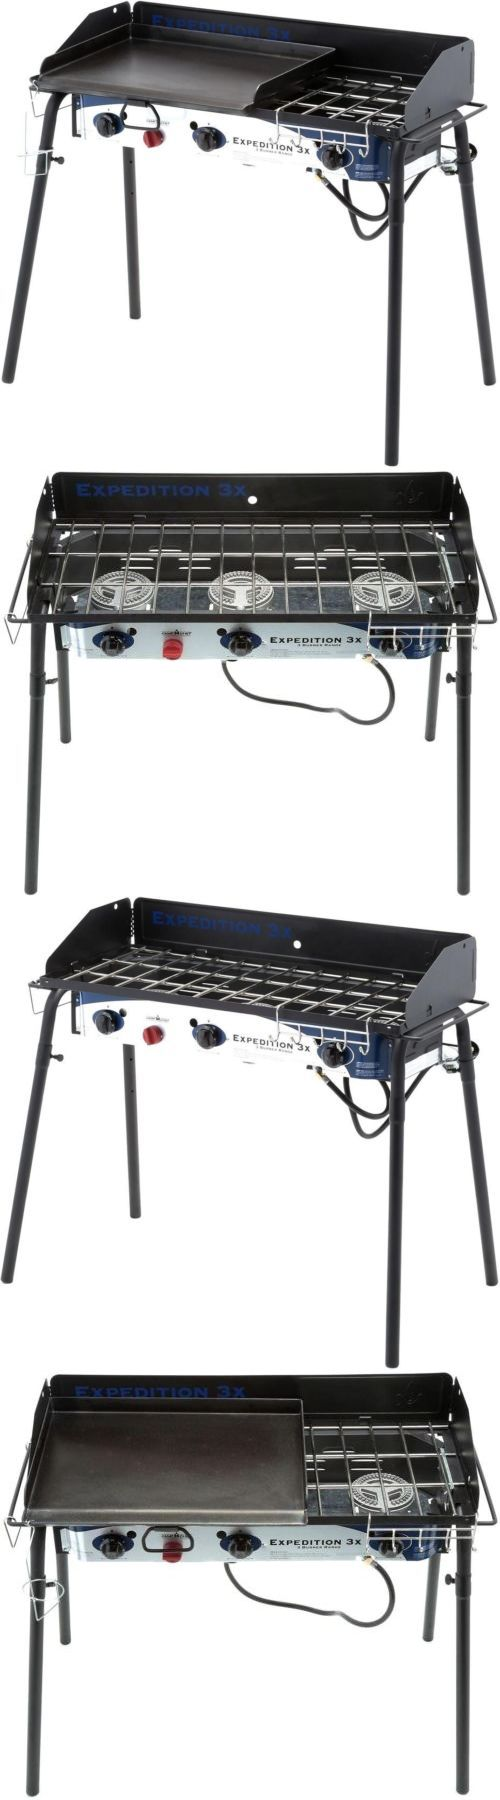 best 25 propane griddle ideas on pinterest griddle grill